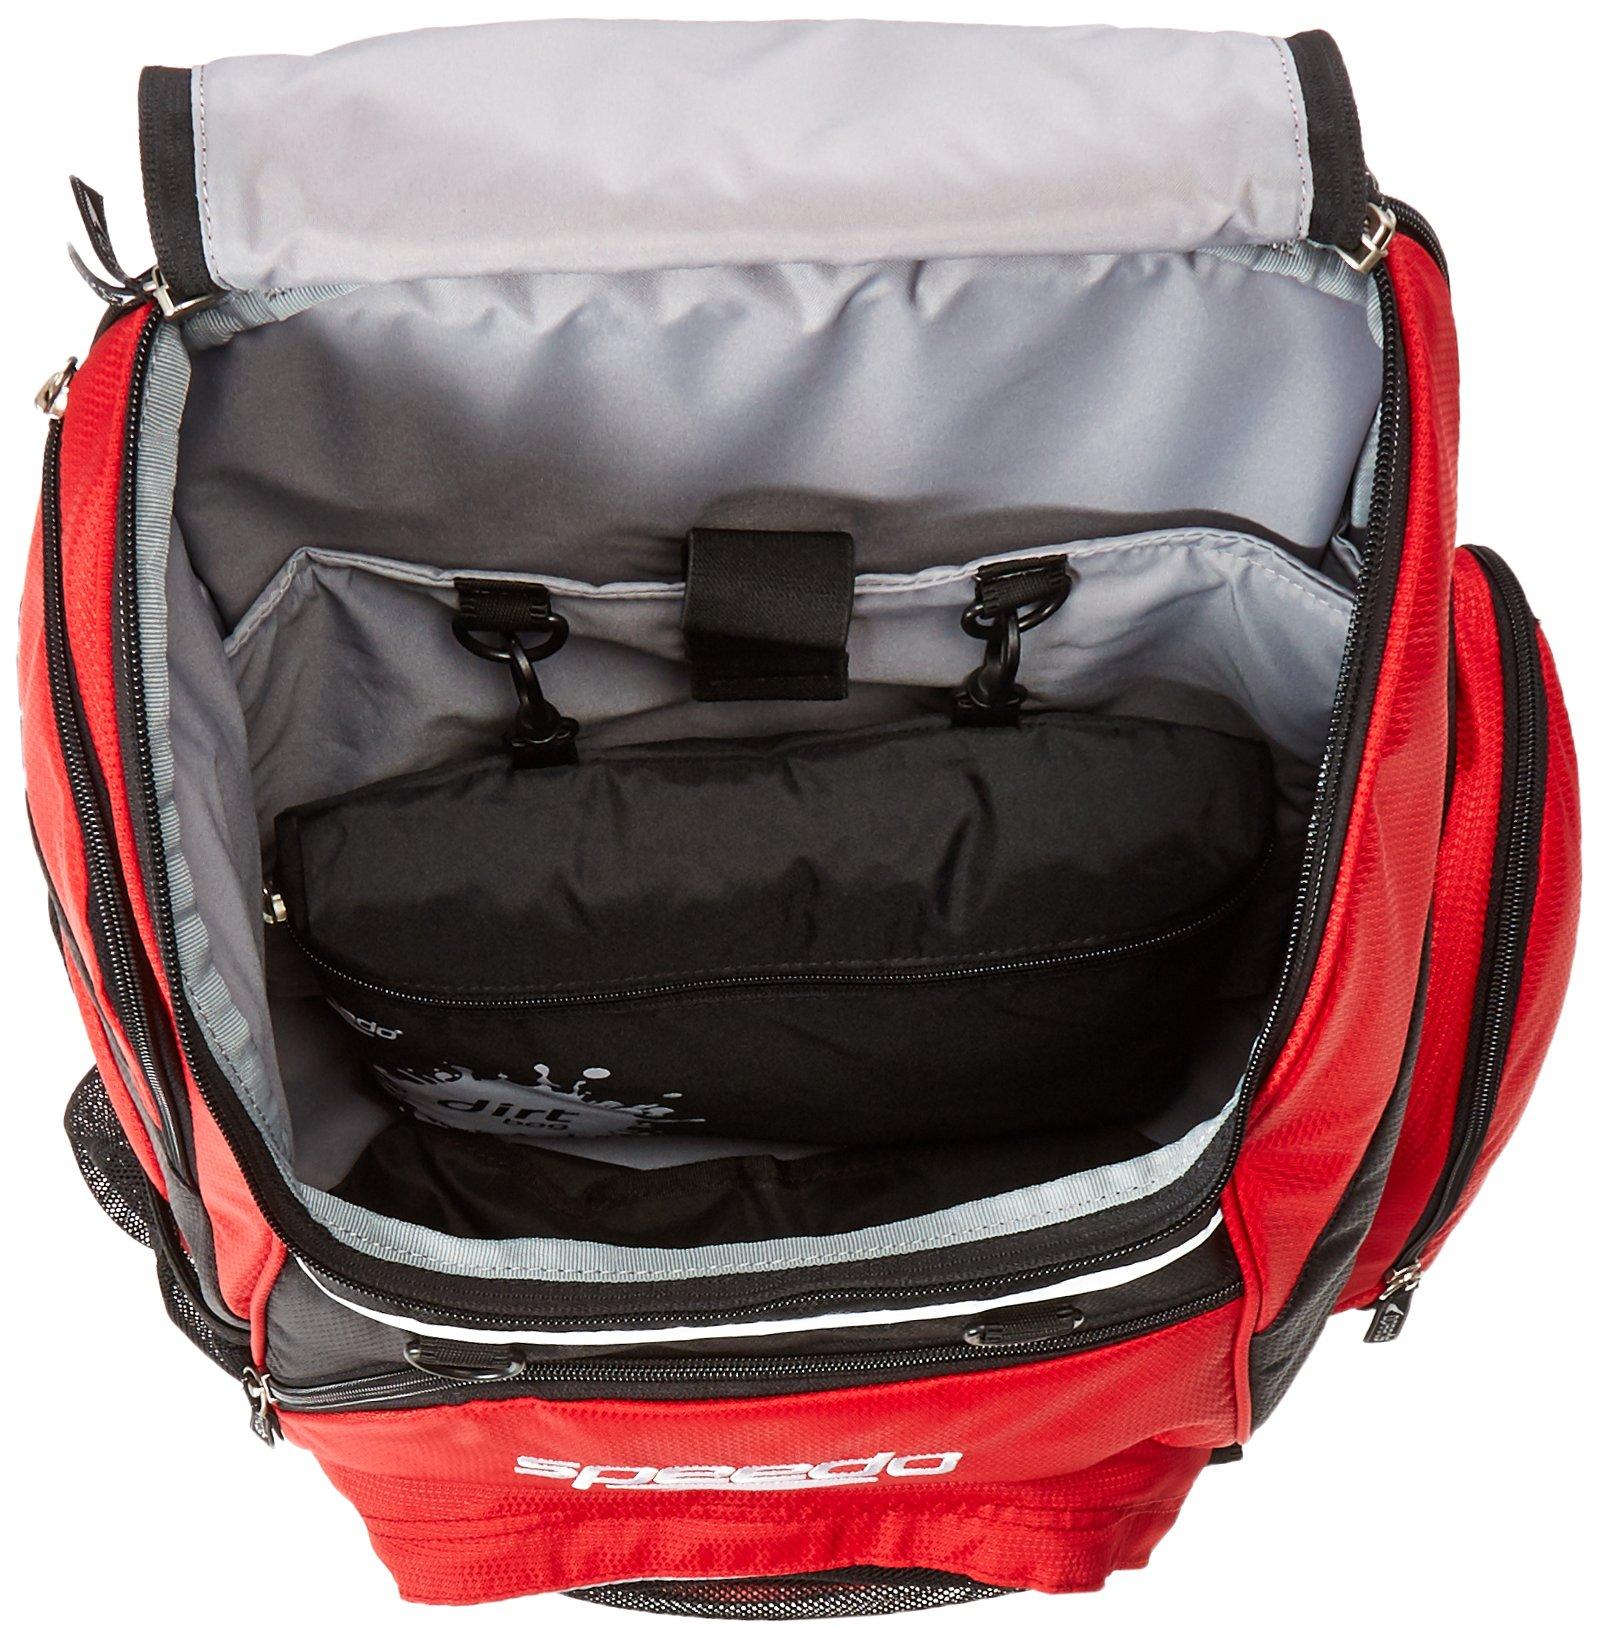 e52cf394d6 Speedo Large Teamster Backpack